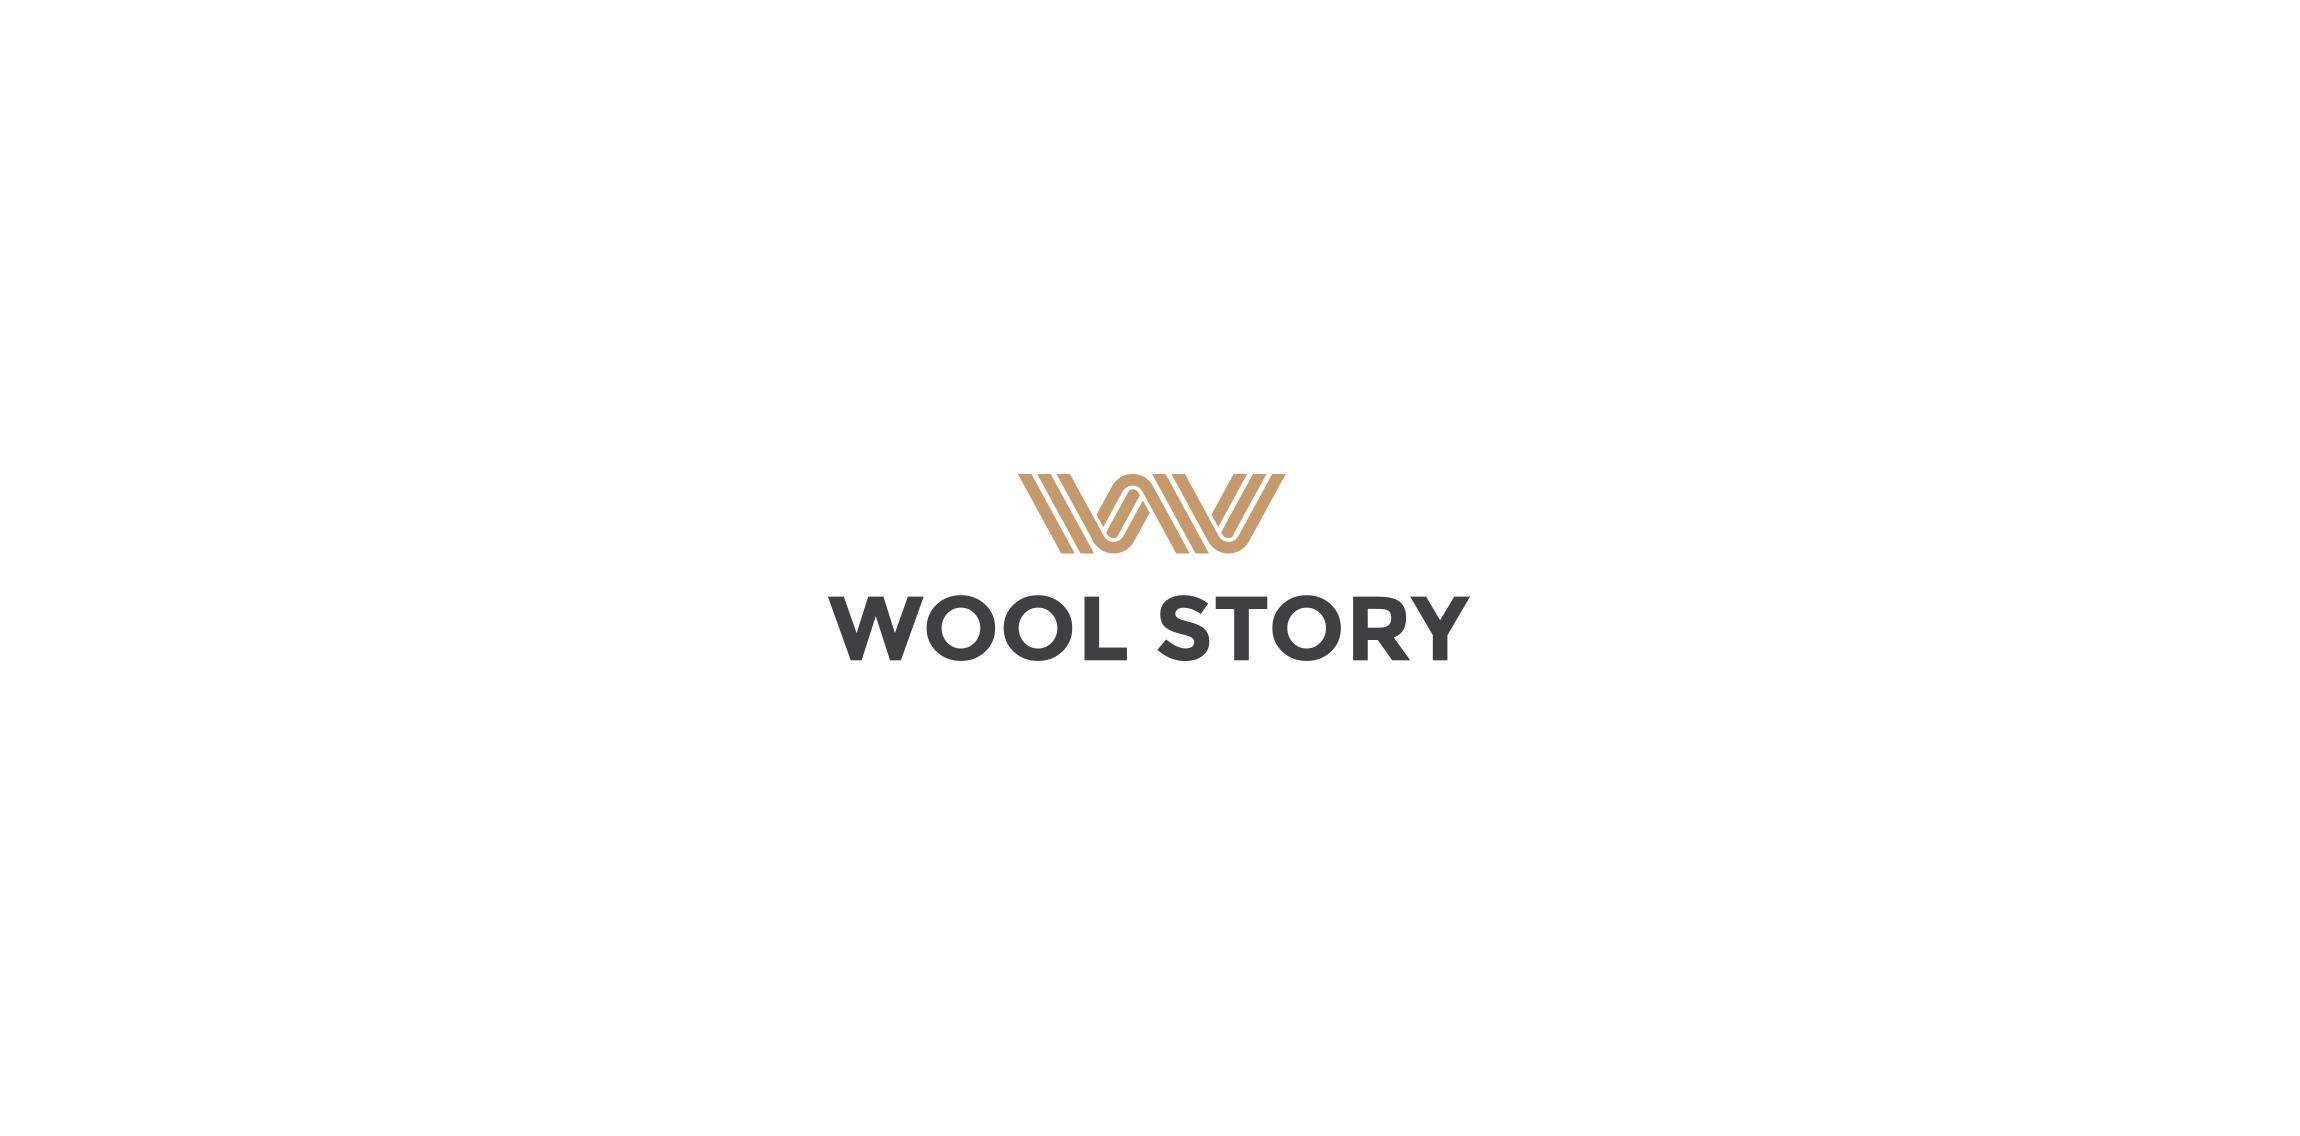 Wool Story